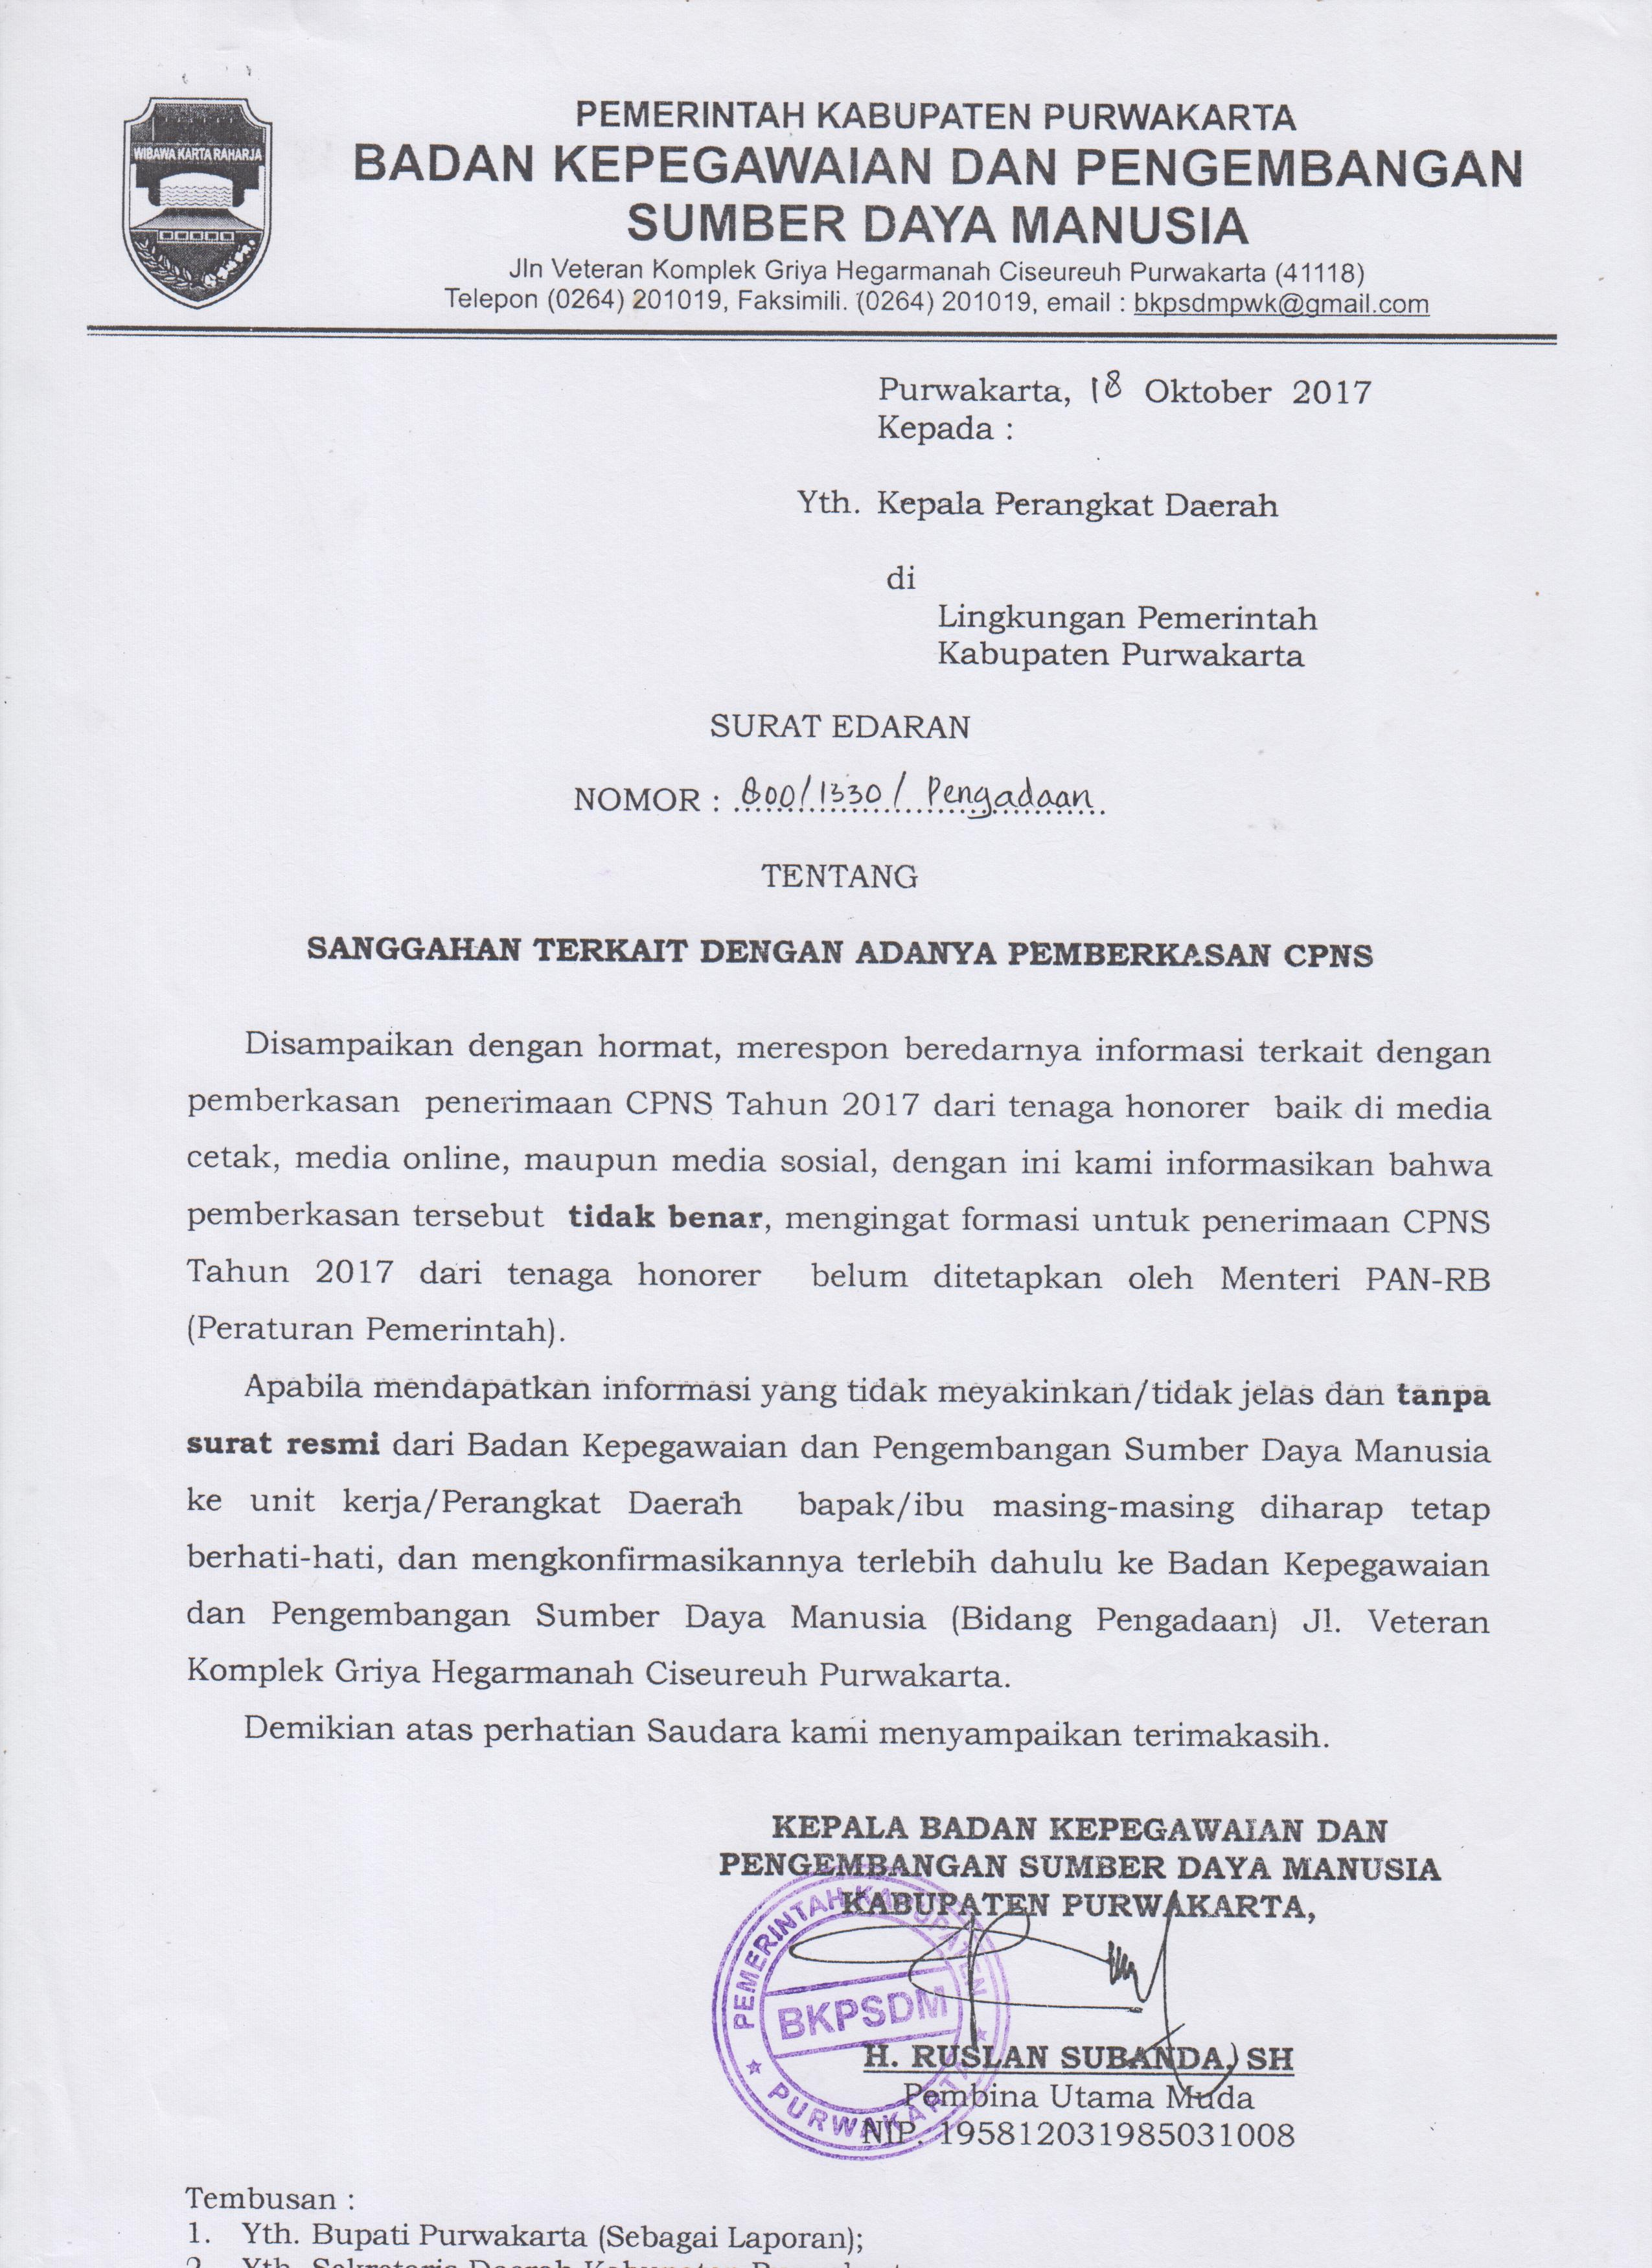 Sanggahan Terkait Dengan Adanya Permberkasan Cpns Kabupaten Purwakarta